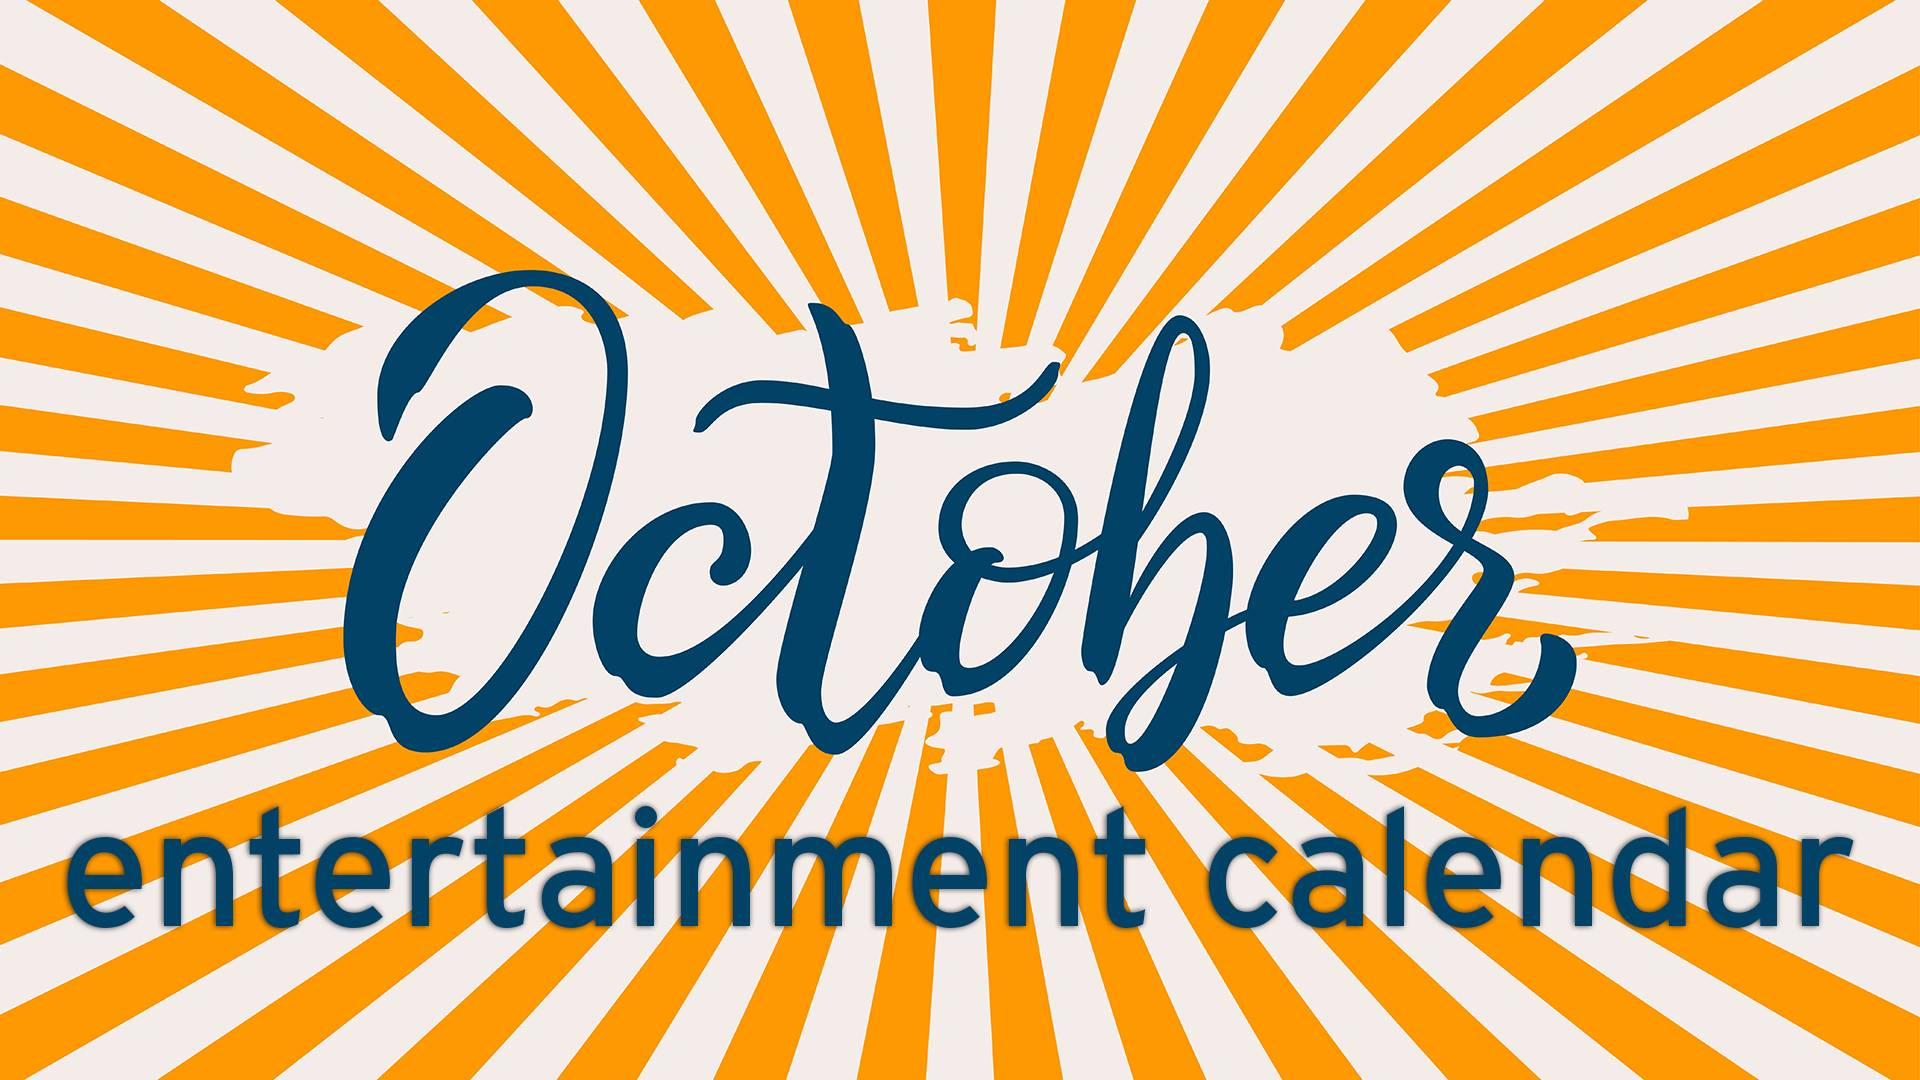 October Entertainment Calendar Halloween Old Dominion Jersey